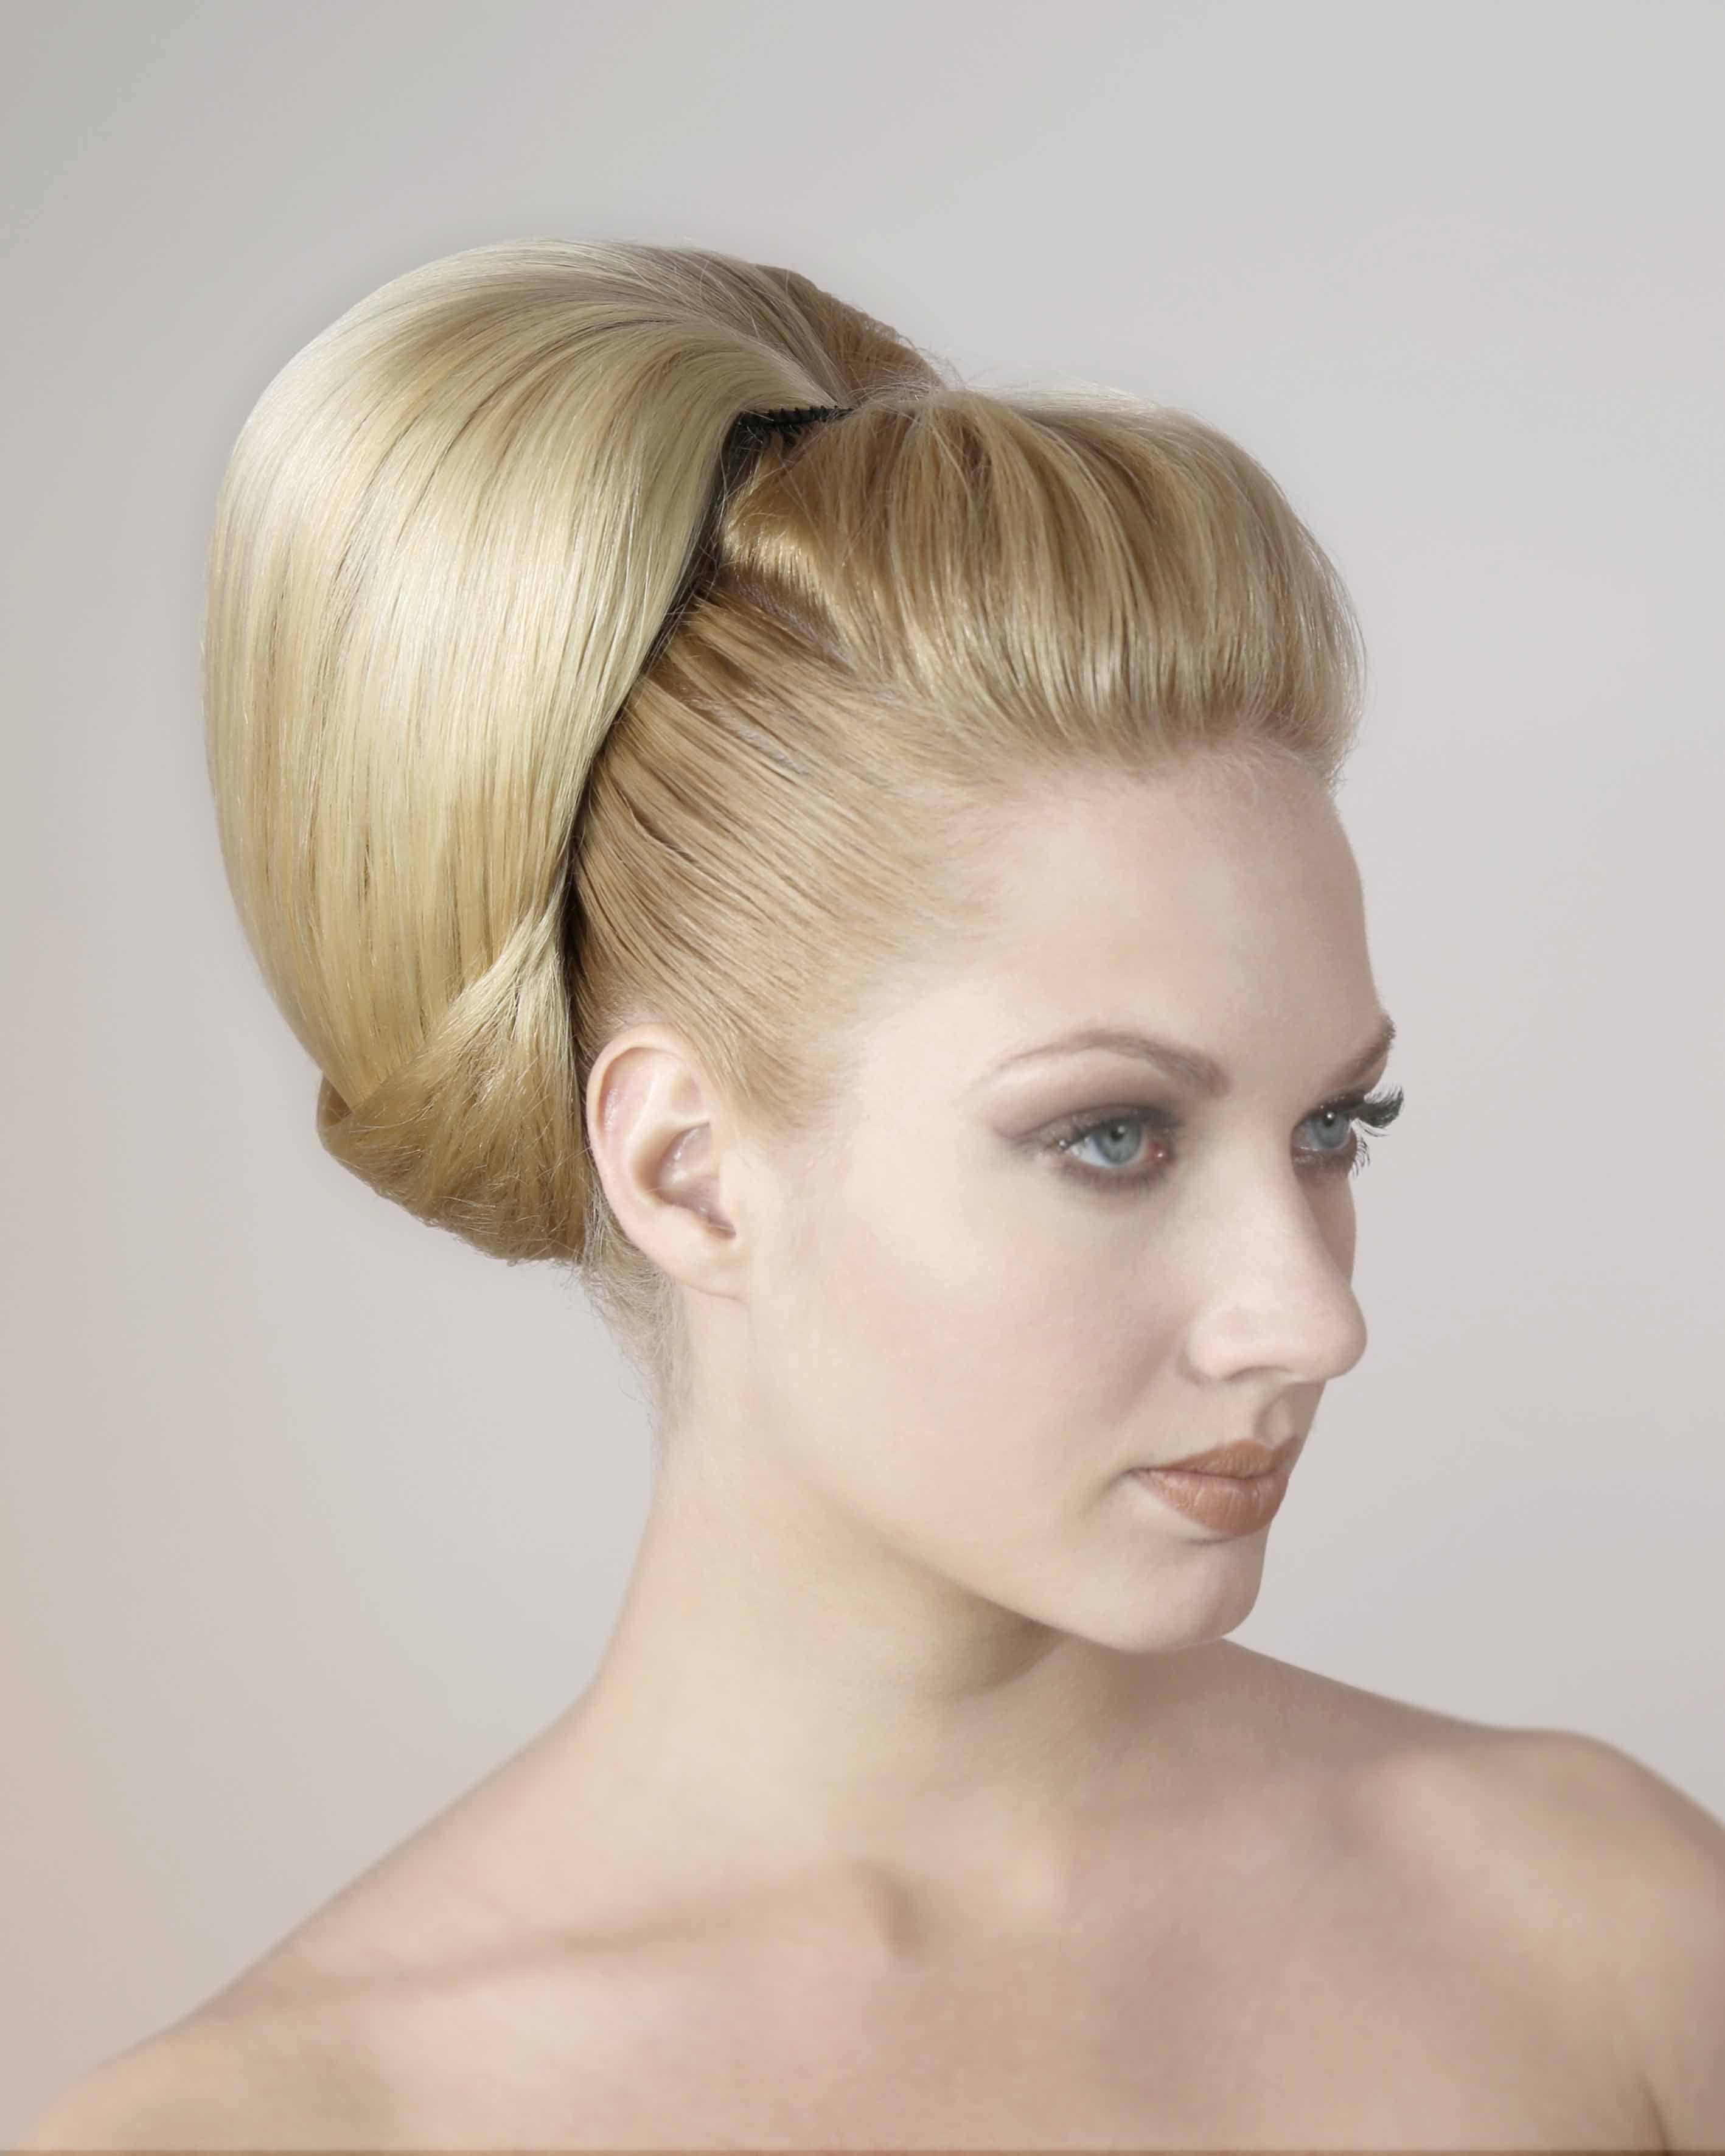 Large Bouffant #BouffantHair   Bouffant Hair   Pinterest   Online ...